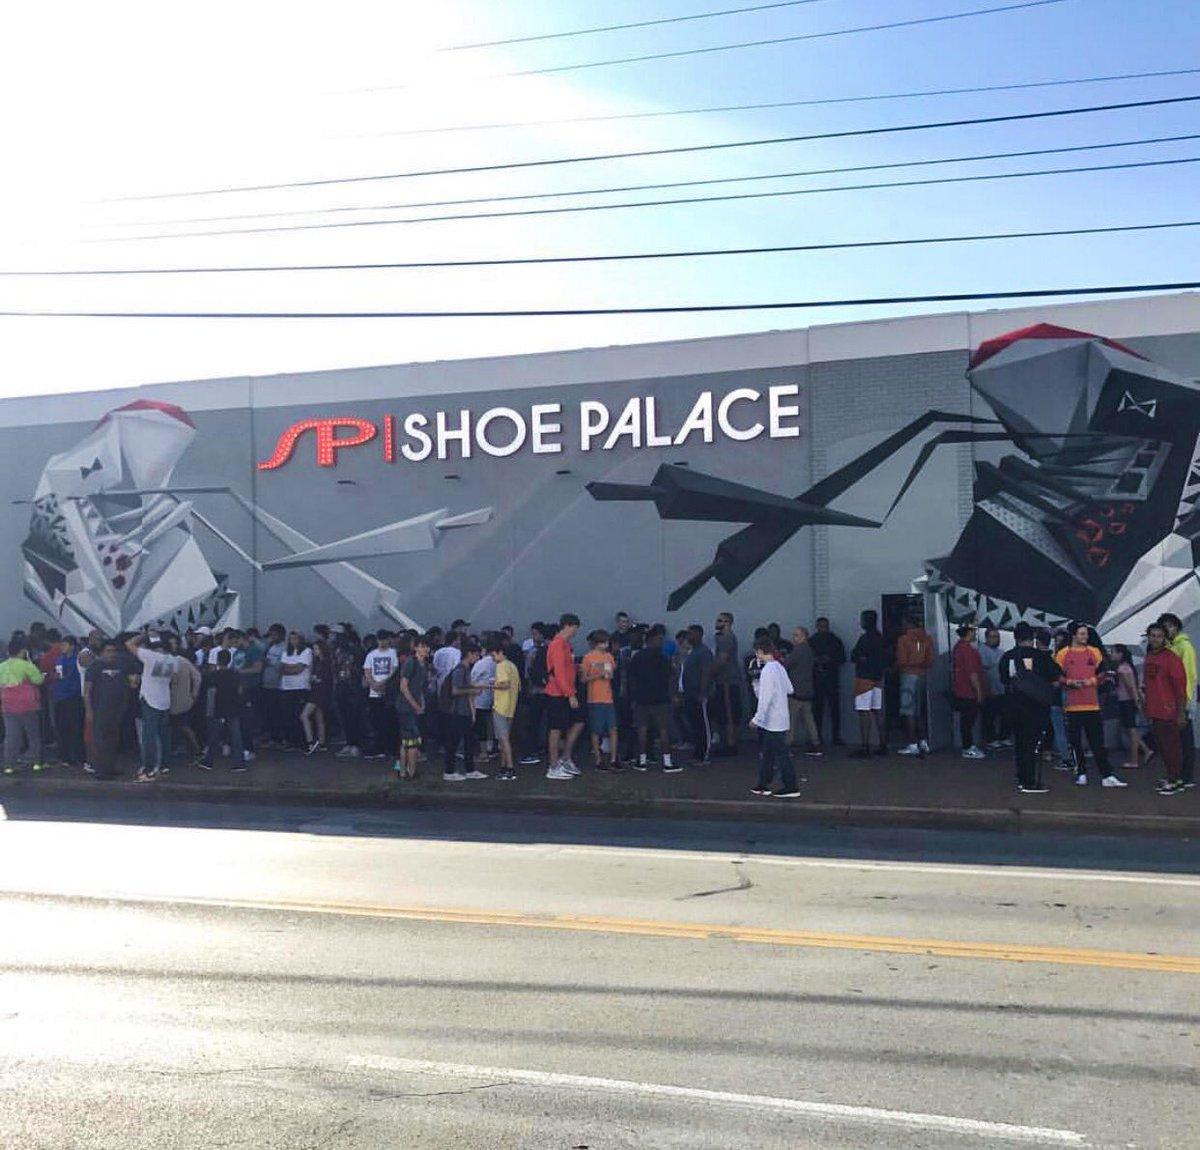 shoe palace austin tx